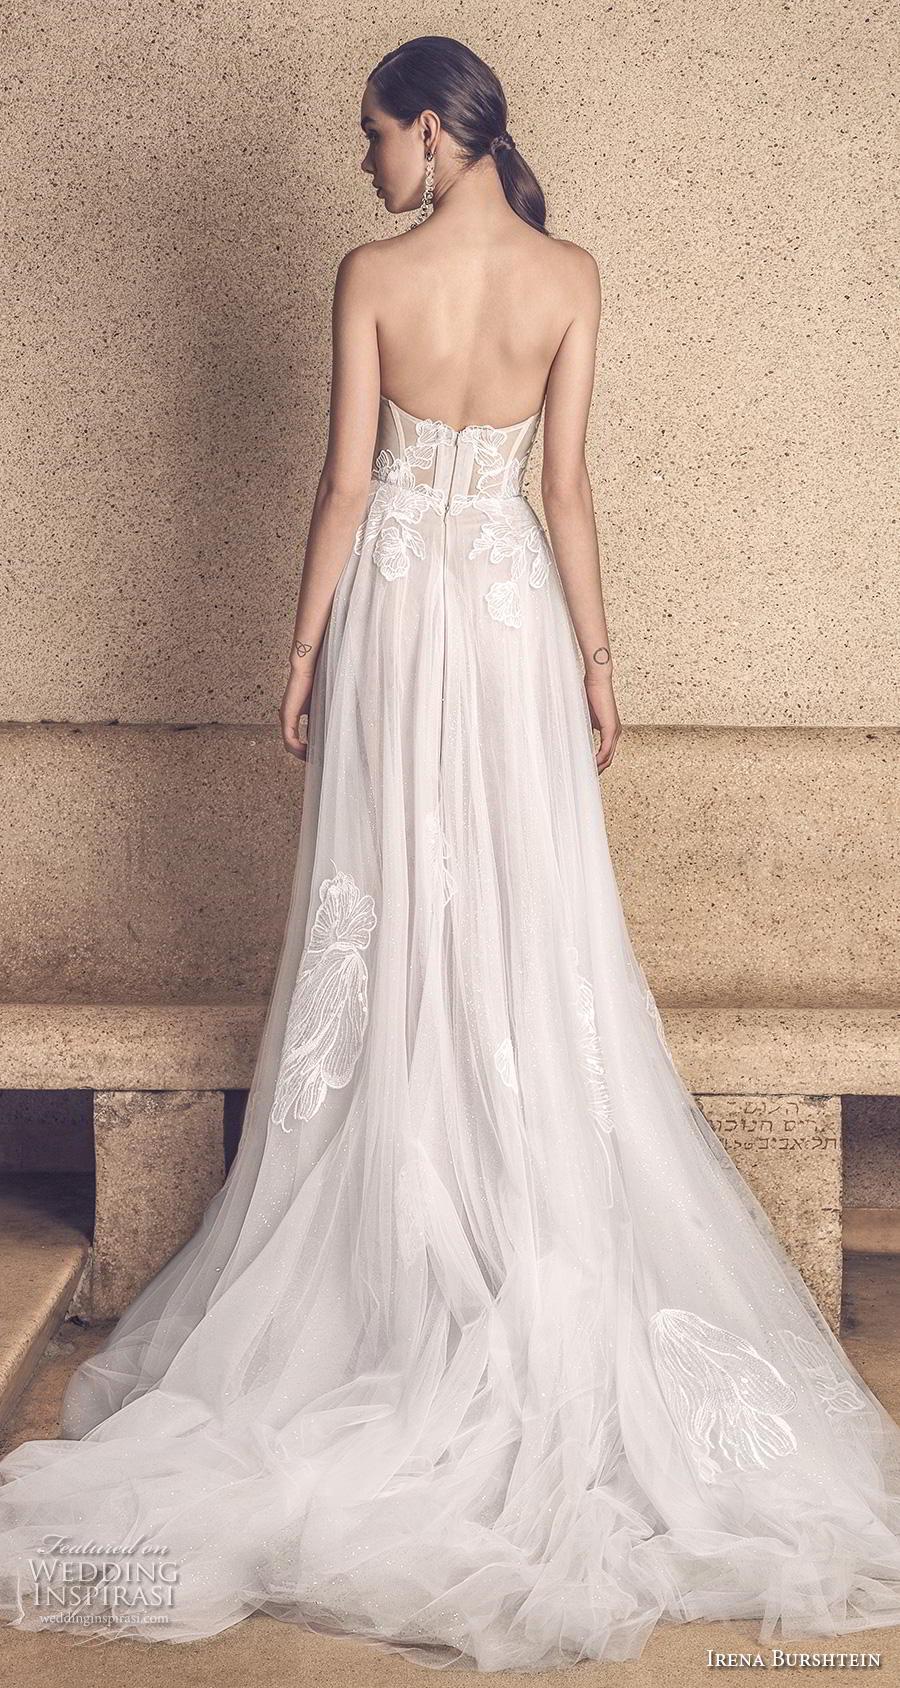 irena burshtein 2020 bridal strapless sweetheart neckline heavily embellished bodice romantic soft a  line wedding dress mid back chapel train (10) bv